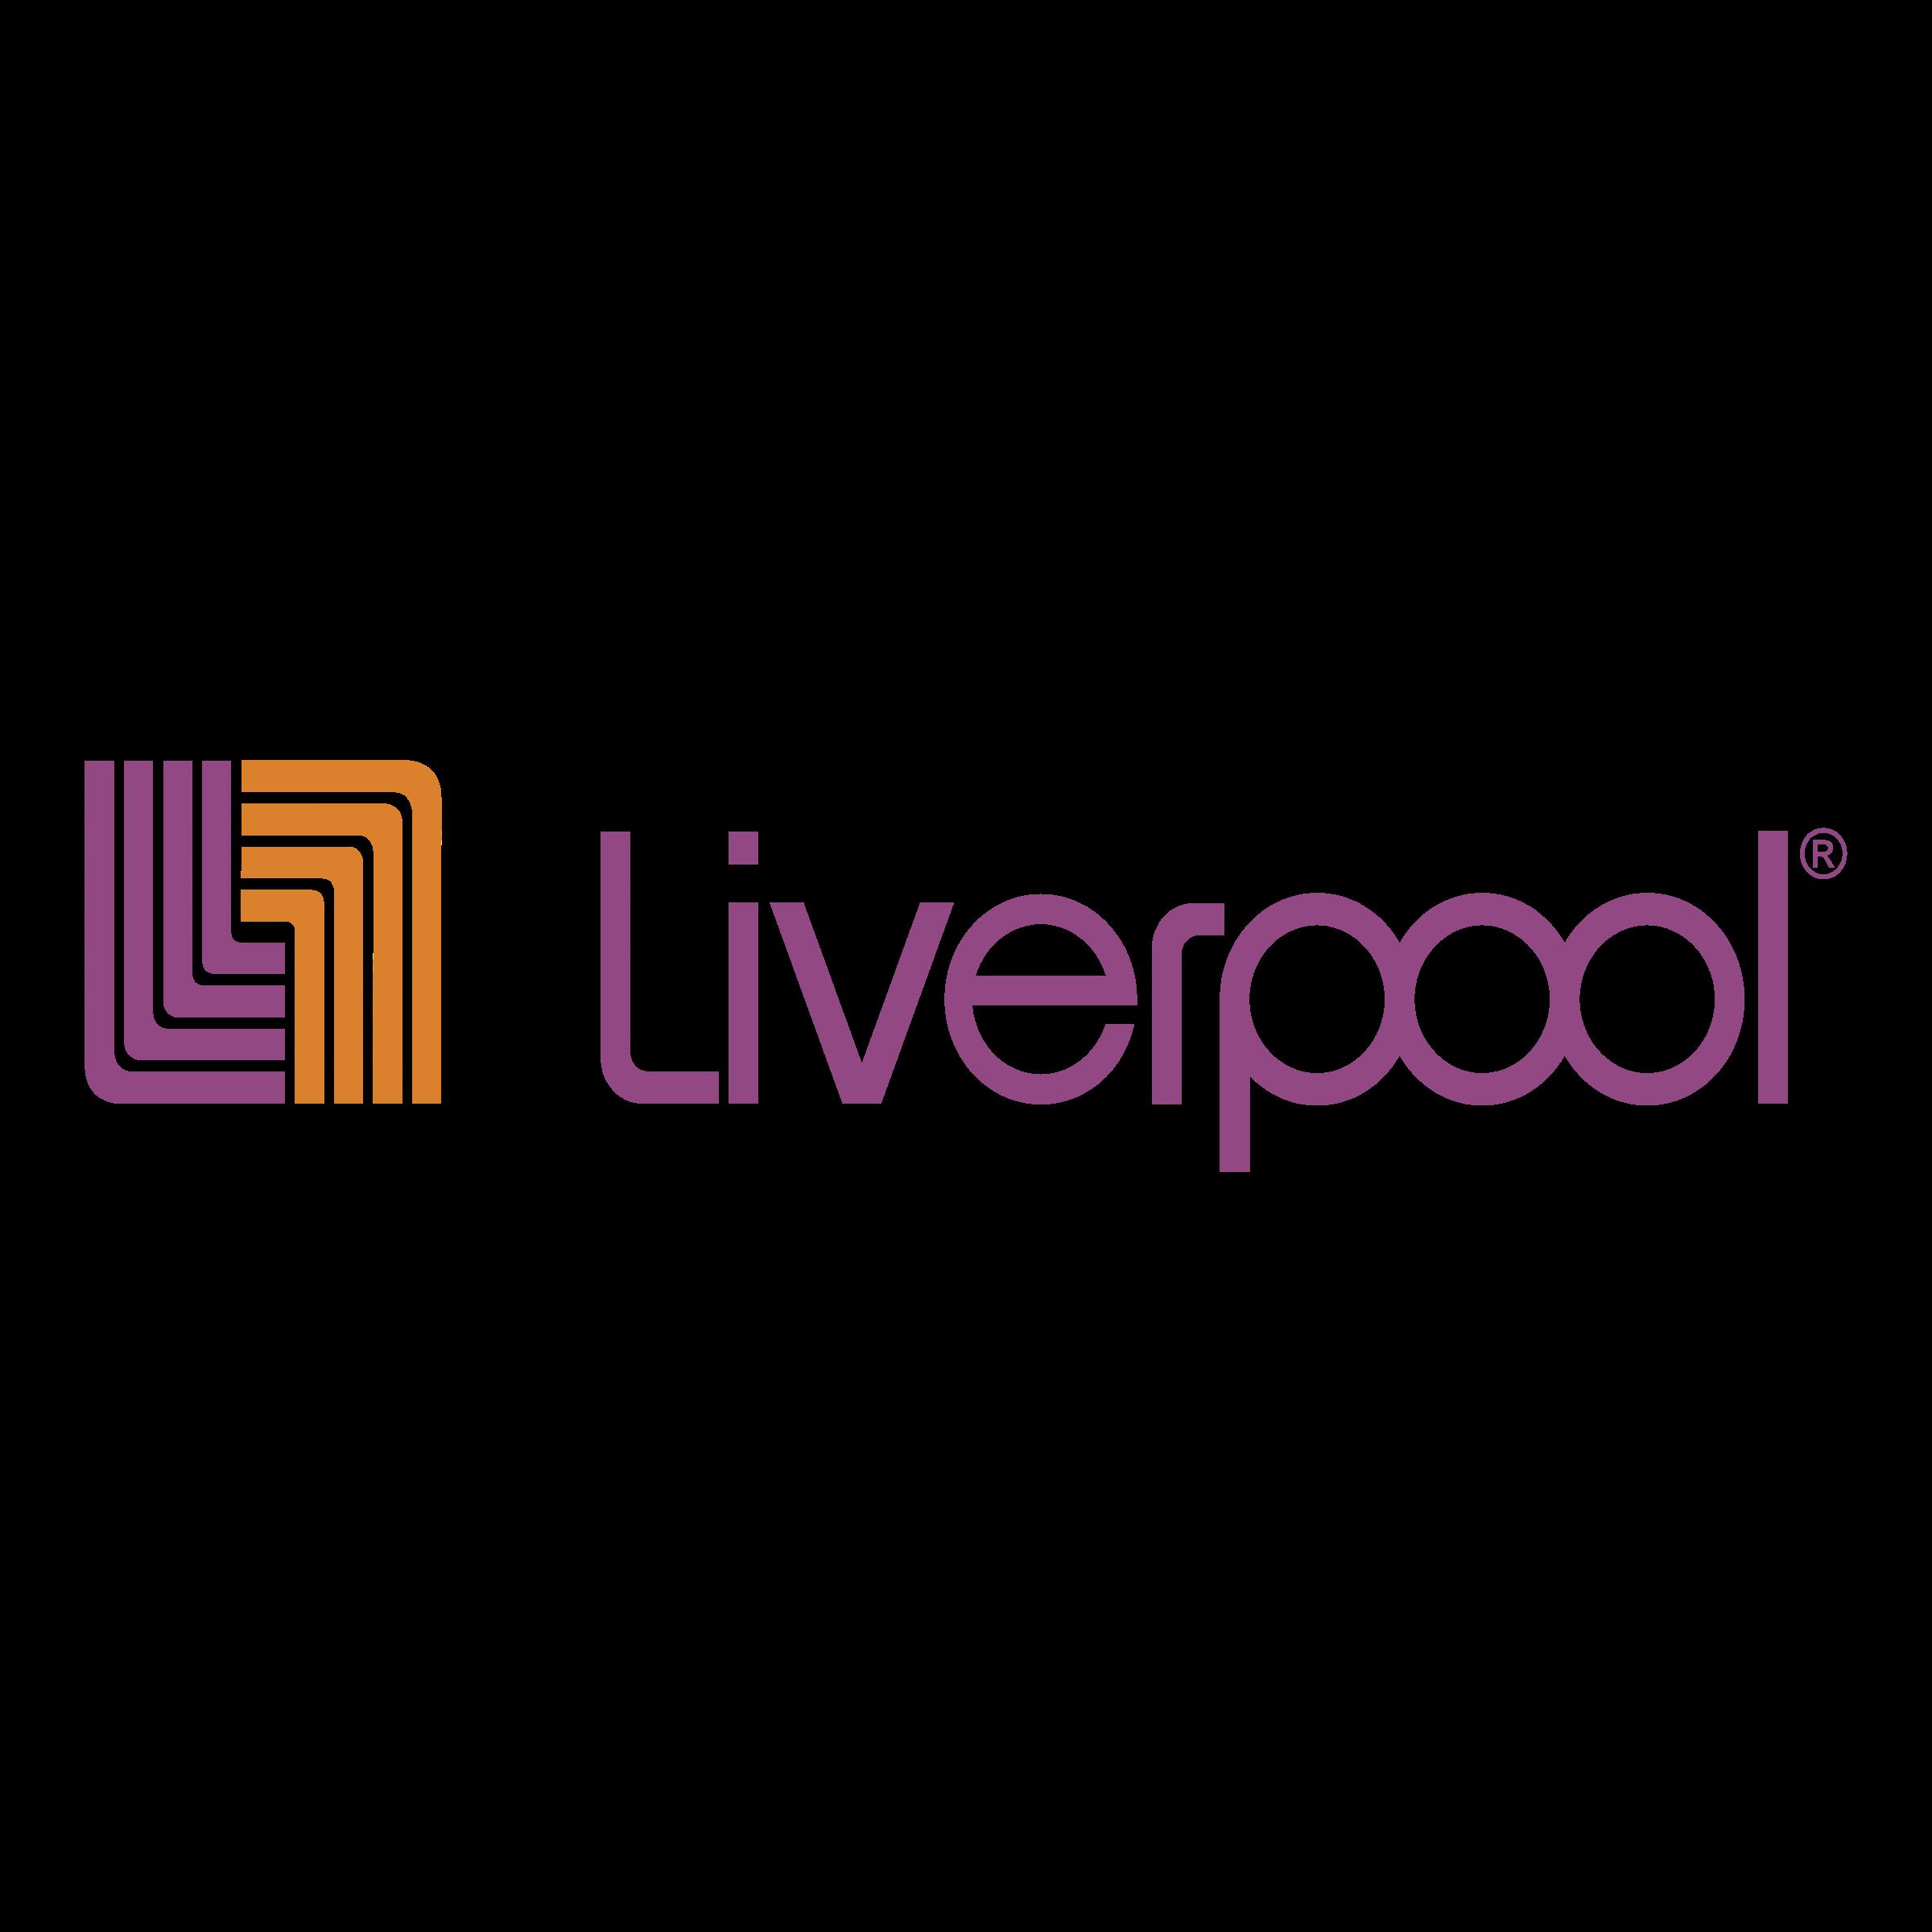 Liverpool Logo Png Transparent Svg Vector Freebie Supply